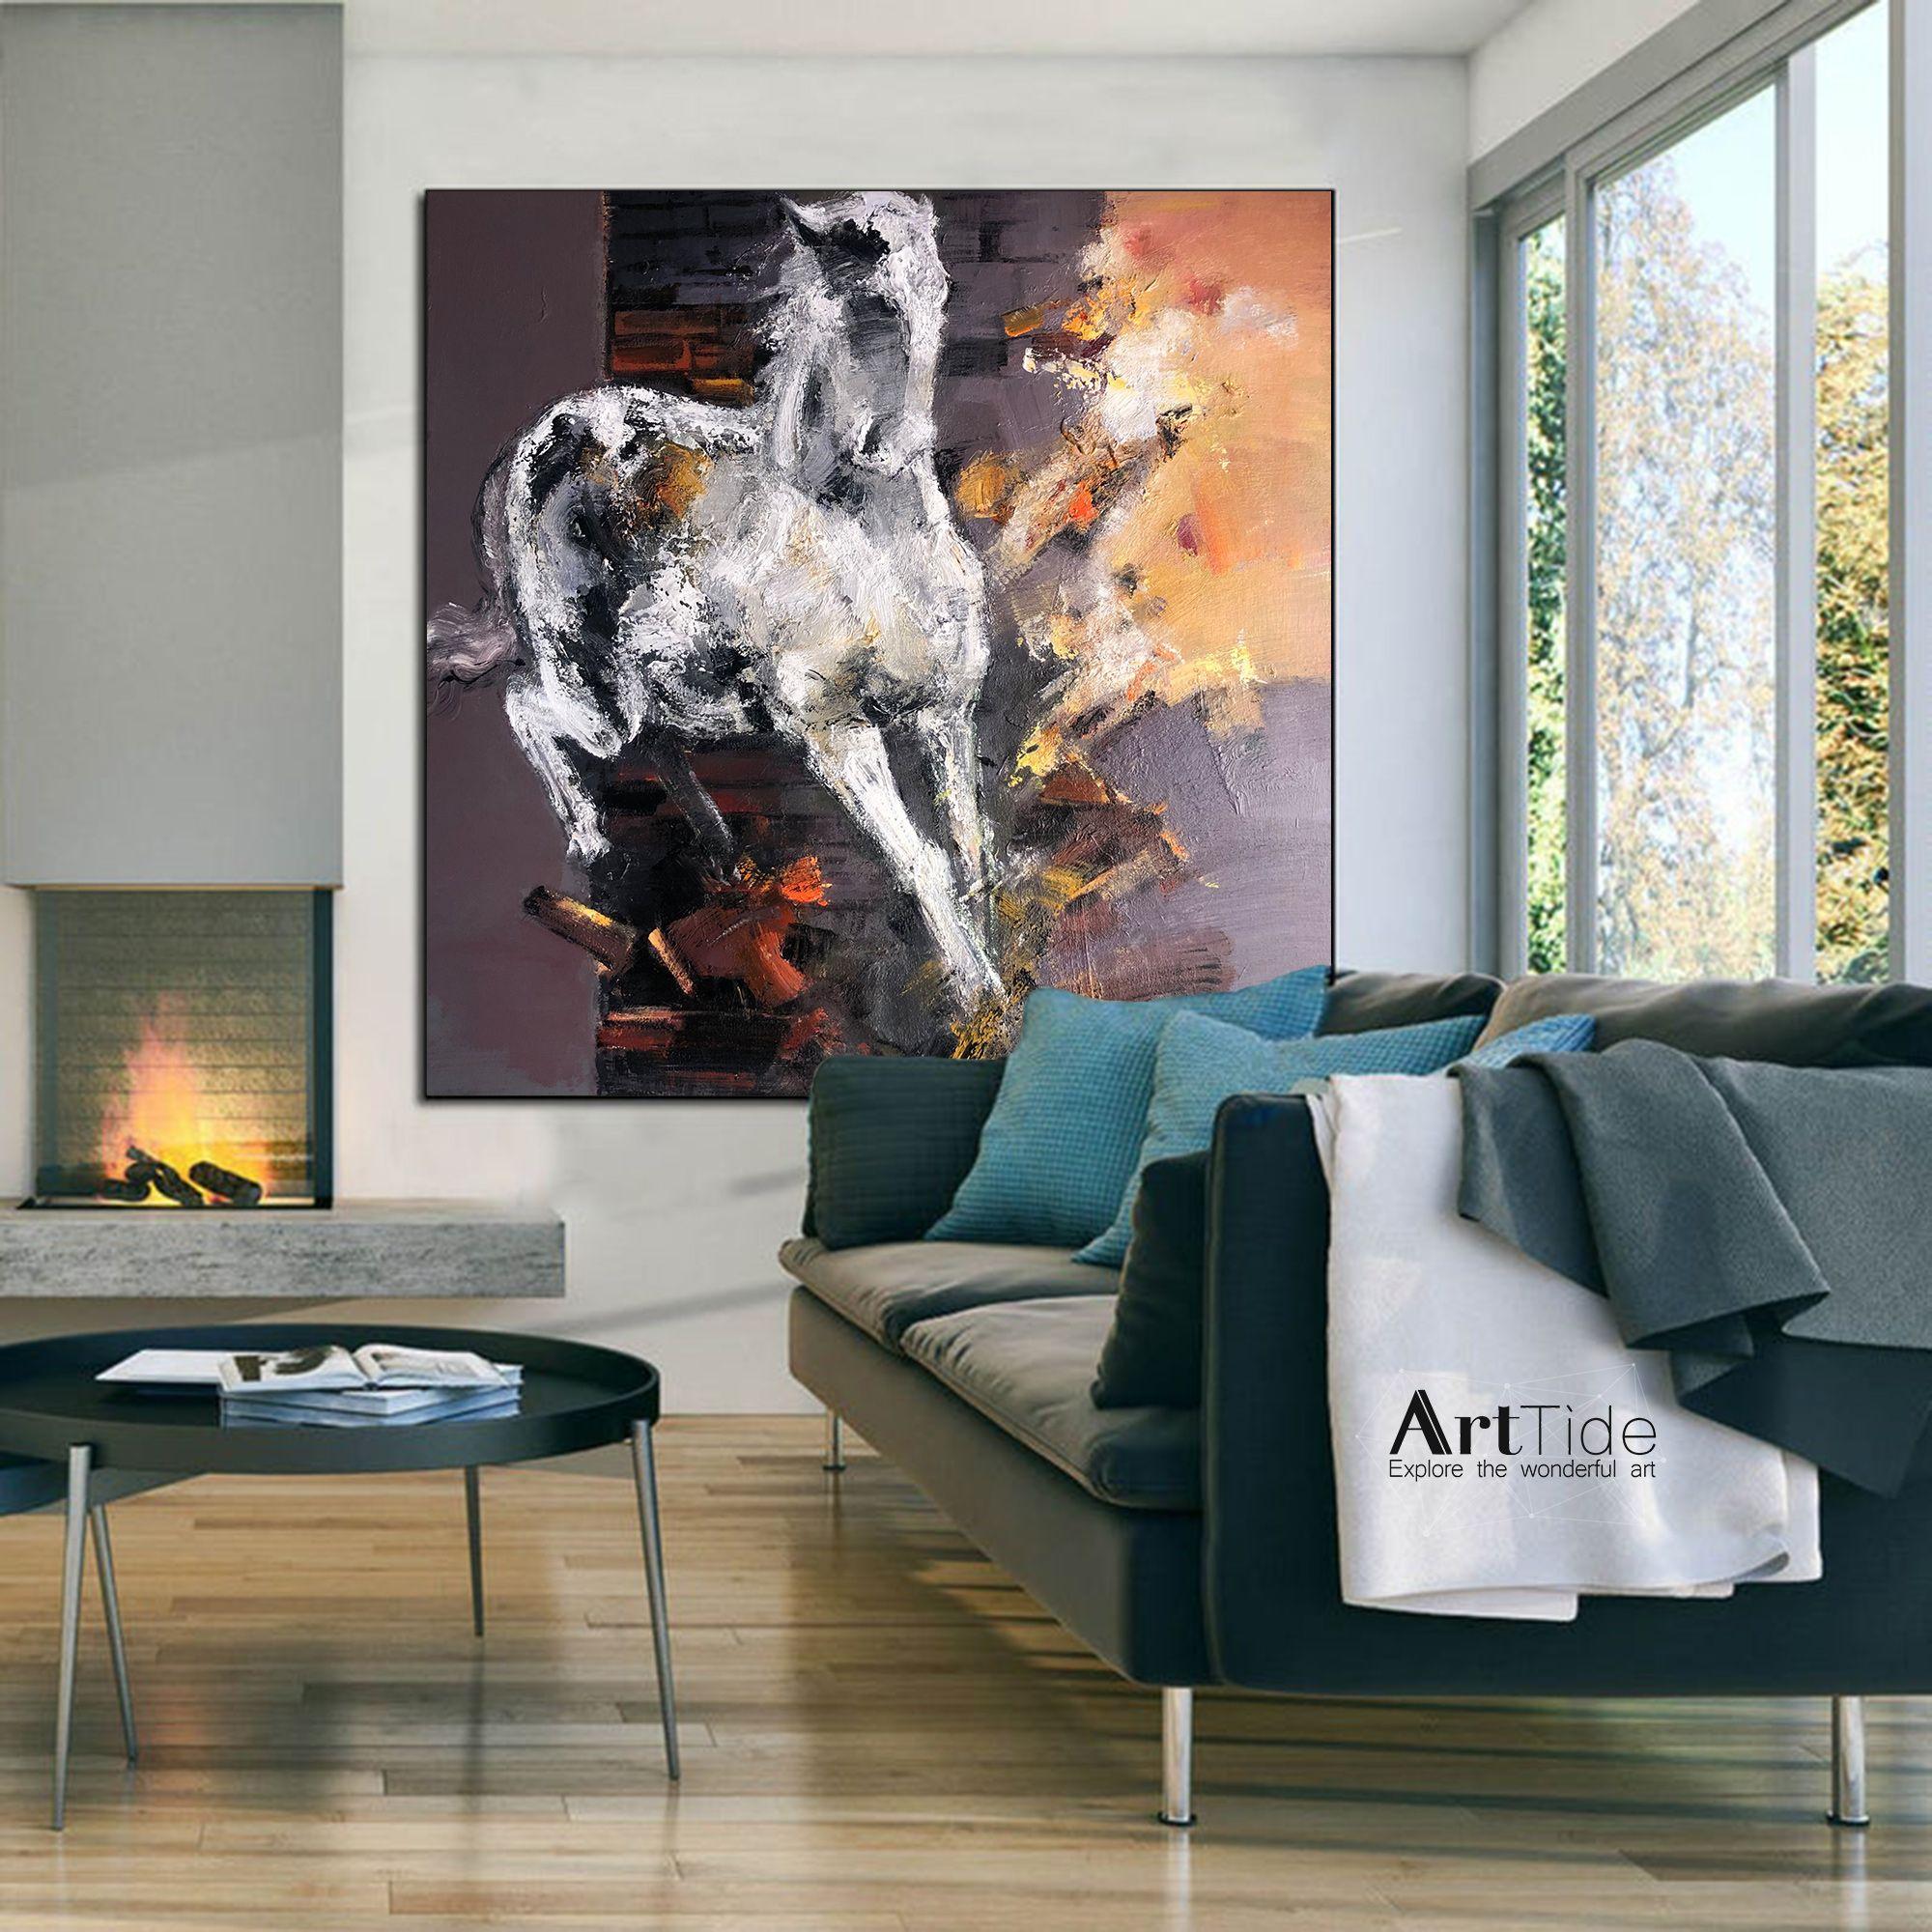 #krzesła#jadalnia#interiordecorators #designhouse#lovemyhouse#minimalinterior#myhouse#livingroomideas#homelove#livingroomdetails#diningroomdecor#diningroomtable#inmylivingroom#privatediningroom#livingroomgoals#livingroomview#livingroomdesigns#diningroomideas #modernlivingroom#livingroomfurniture#mylivingroom#livingrooms#wdomu#mojdom#interiordecorating#designinterior#houseandhome#designhome#myhomedecor